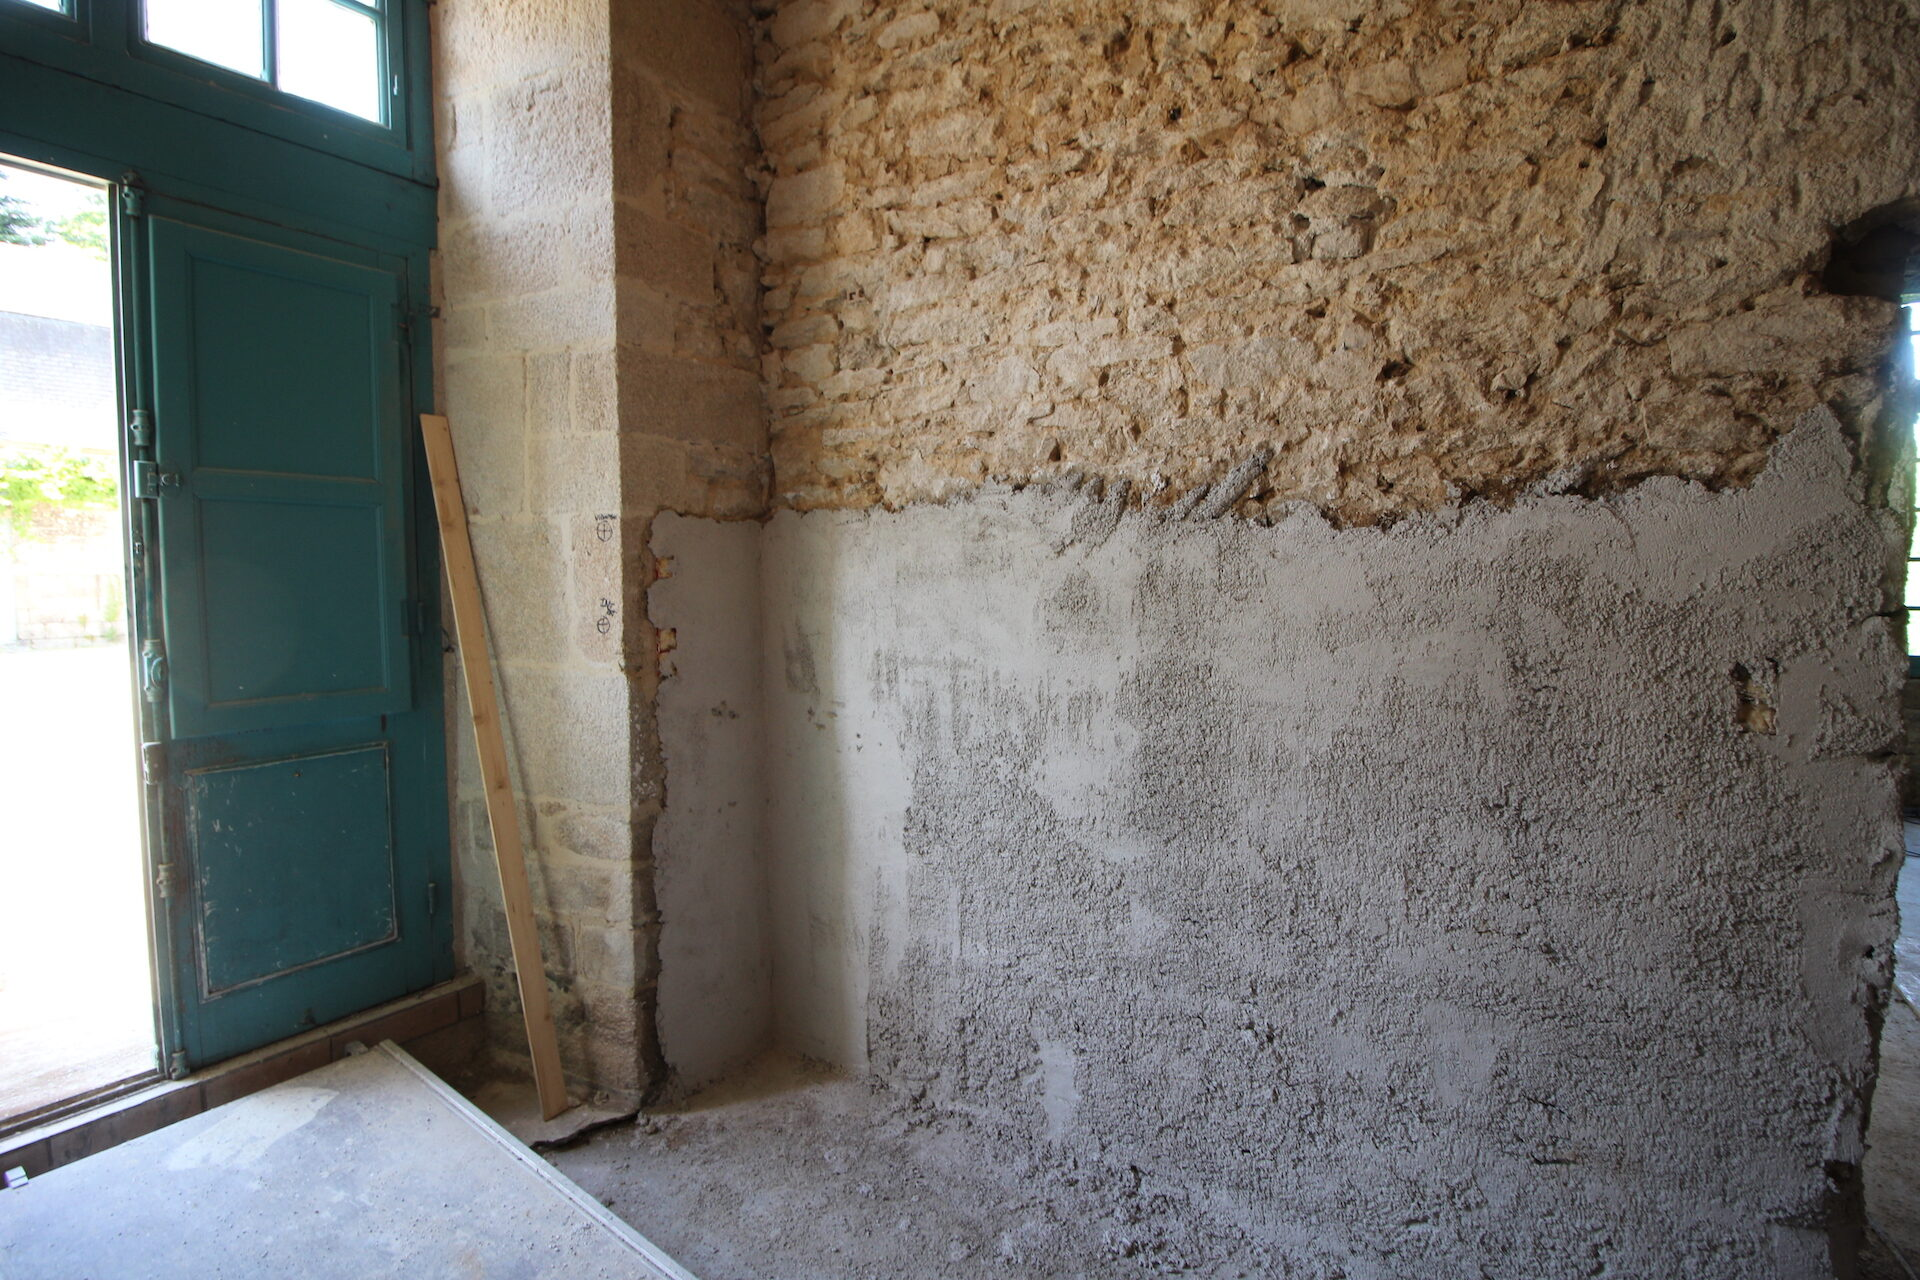 CSDK Lissage de murs en terre Bretagne 4 1920x1280 - Engagement durable - CSDK Lissage de murs en terre Bretagne 4 1920x1280